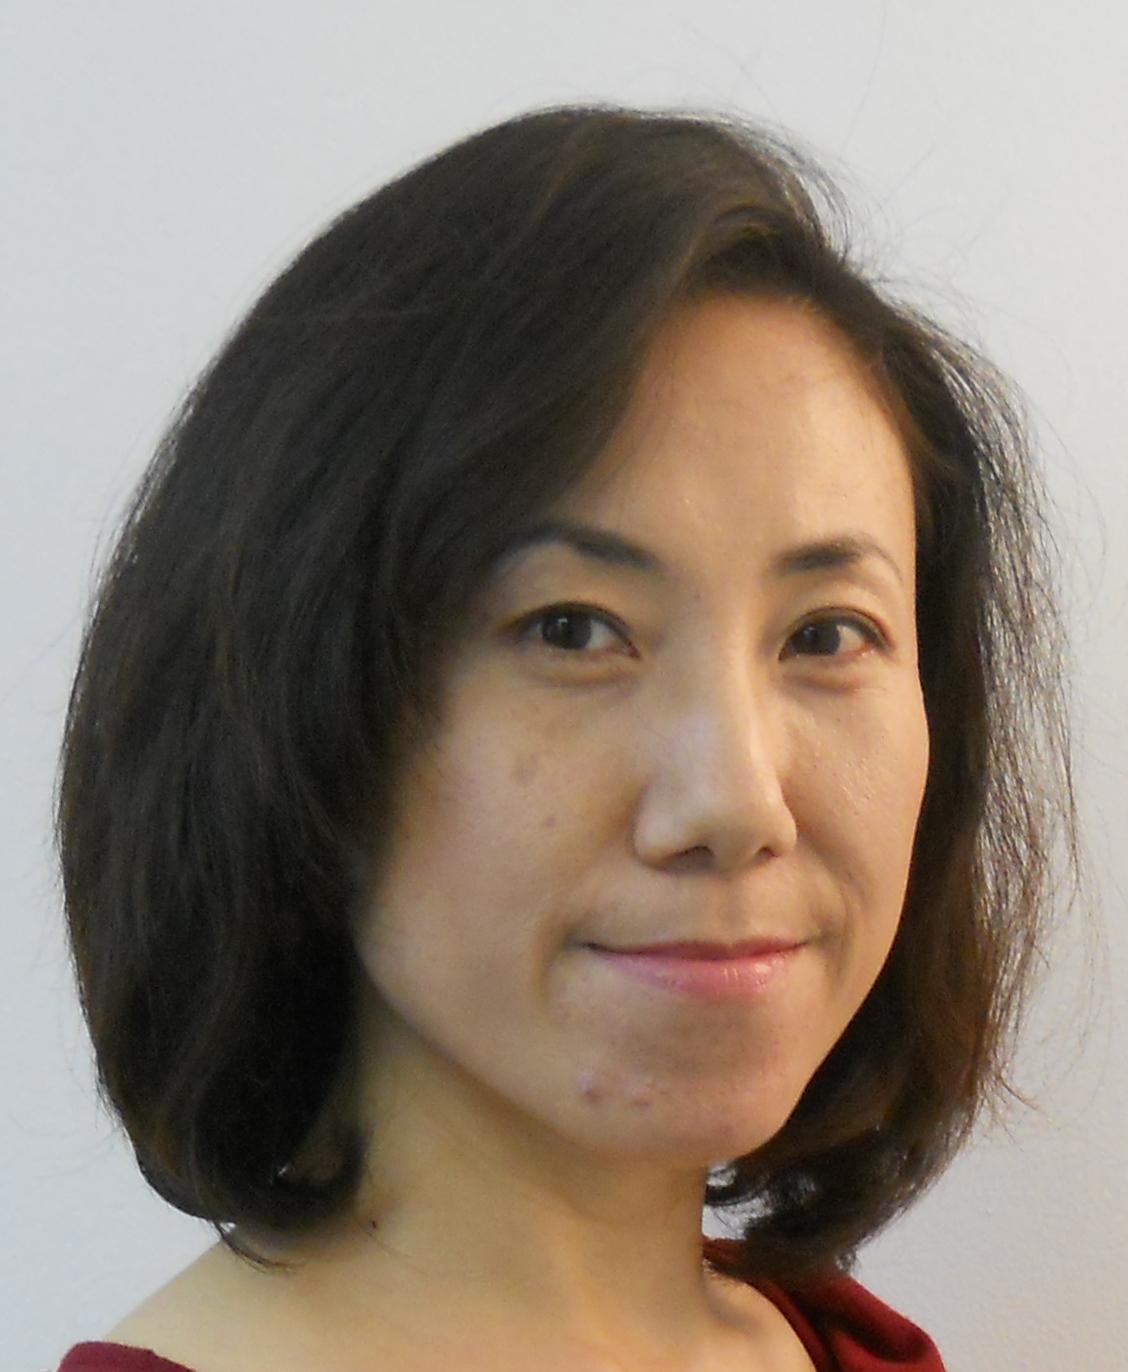 Dr. JinHi Bowman